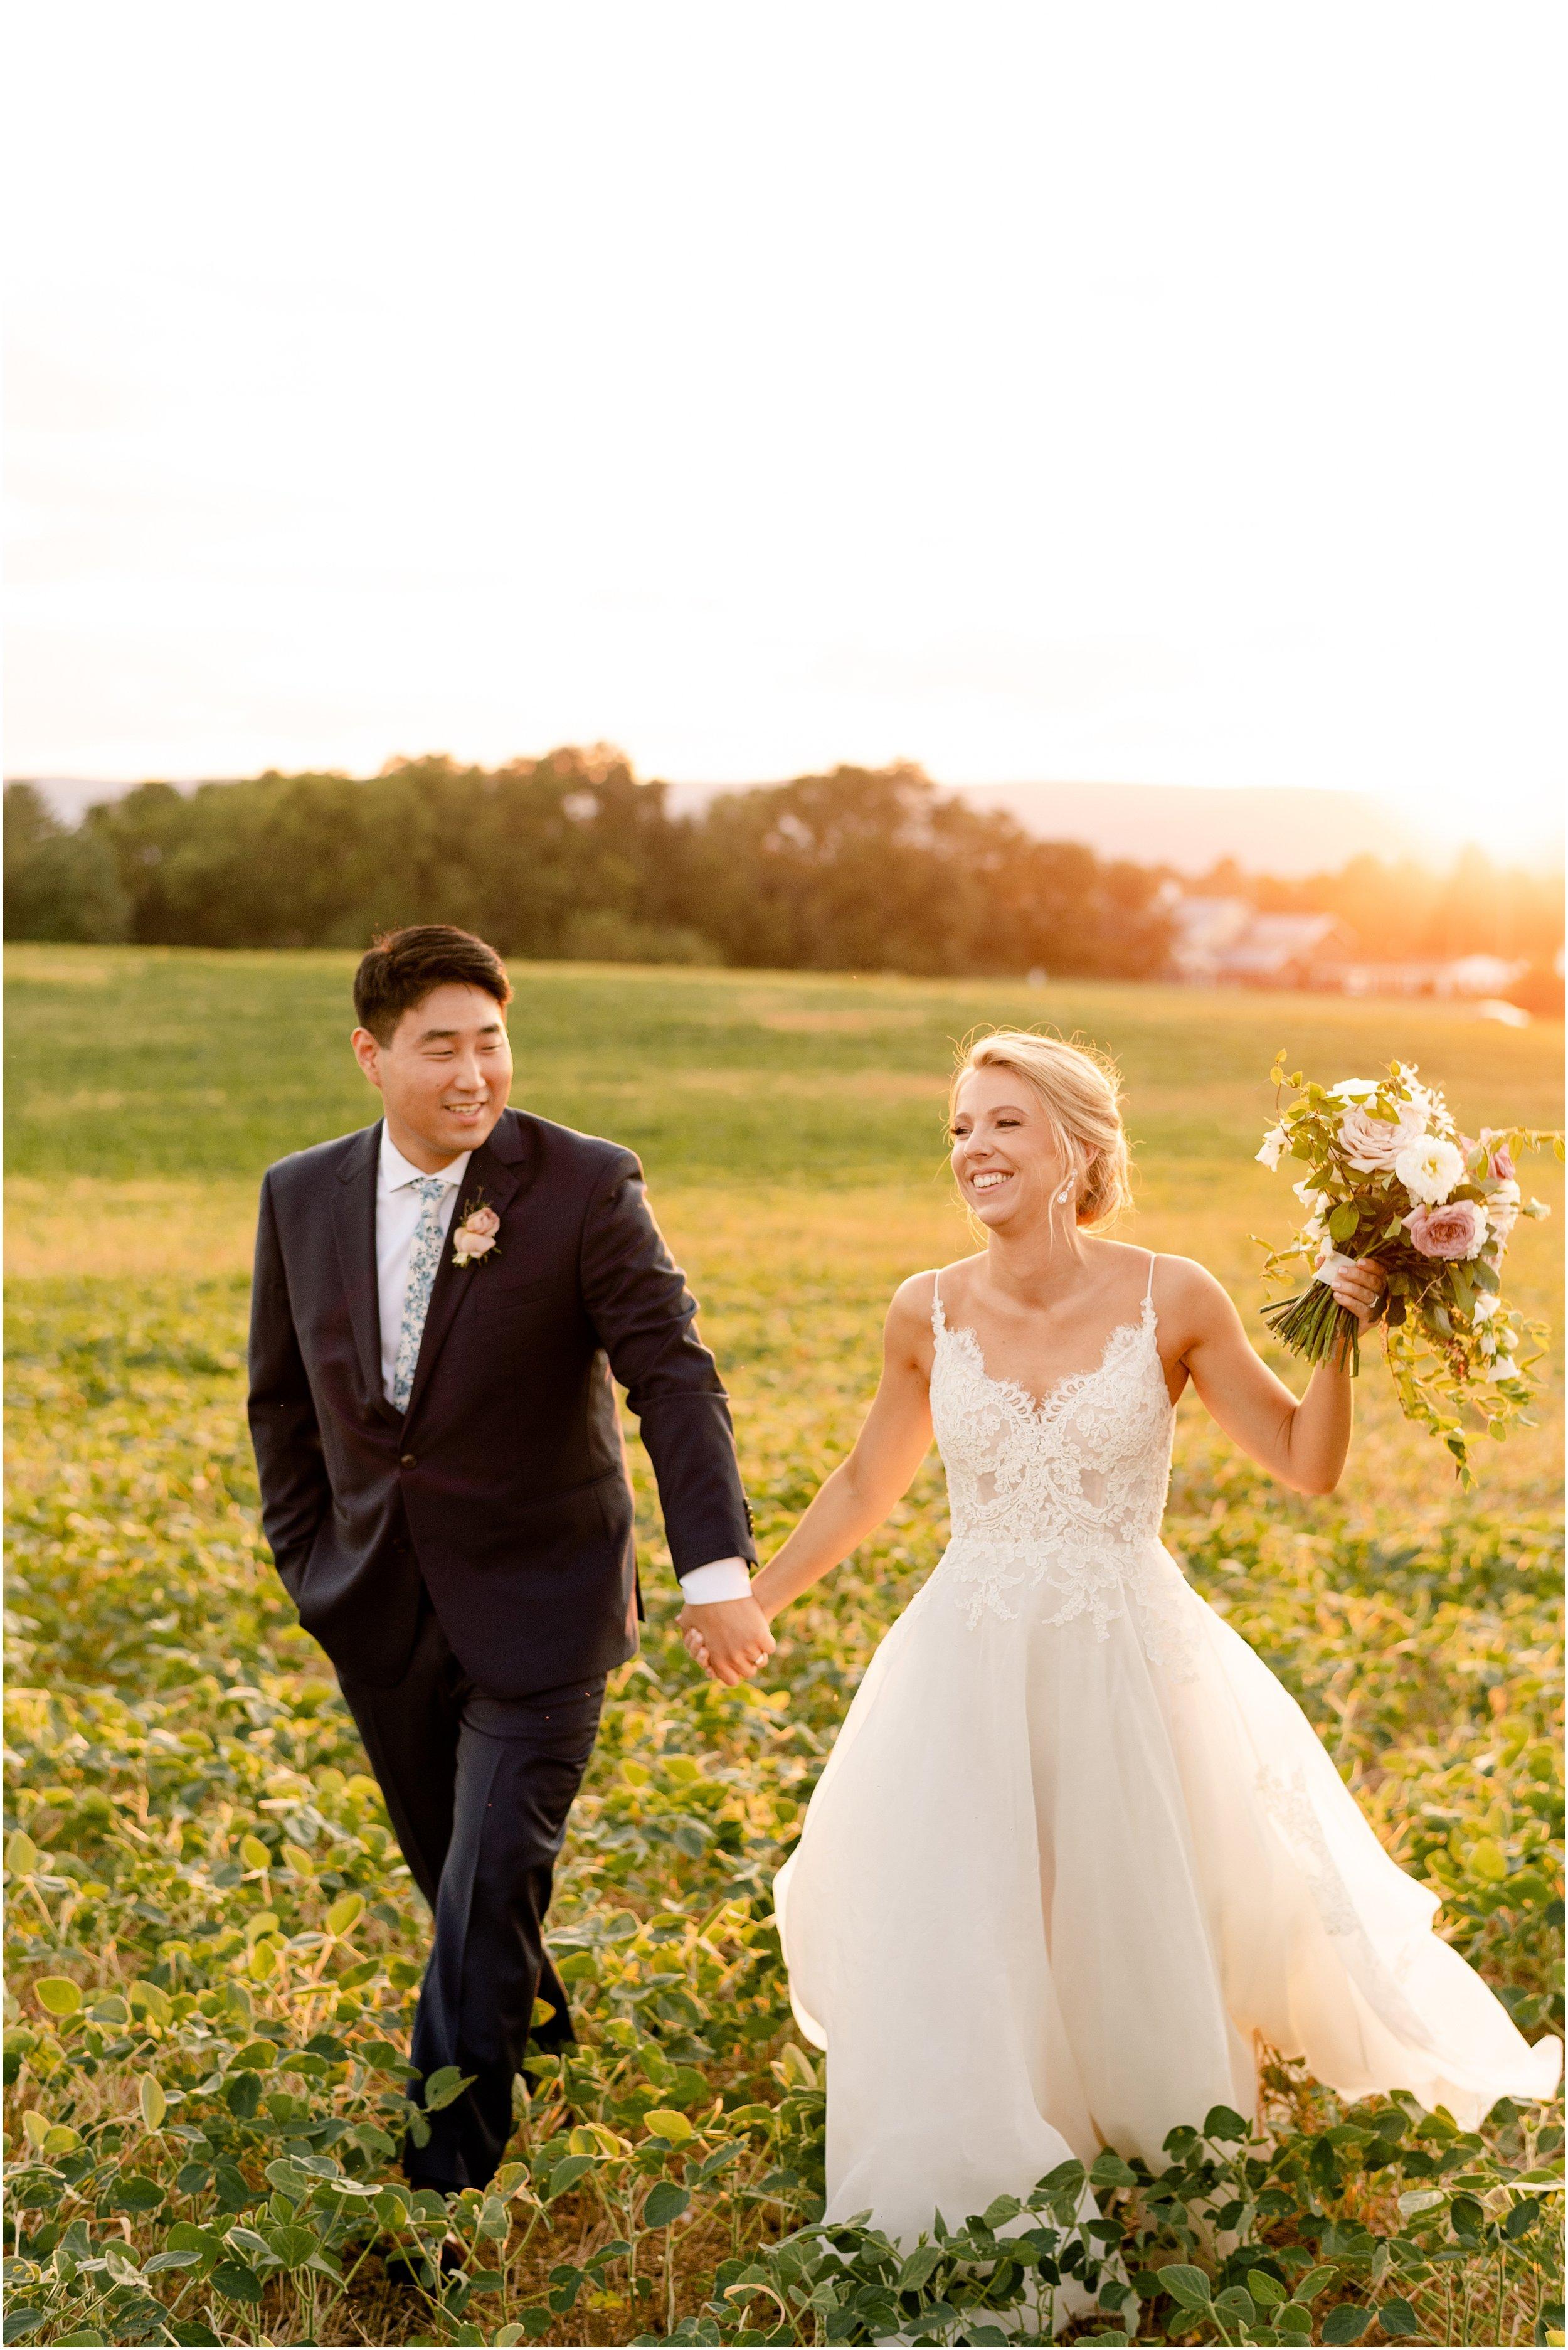 hannah leigh photography Walkers Overlook Wedding Walkersville MD_3571.jpg